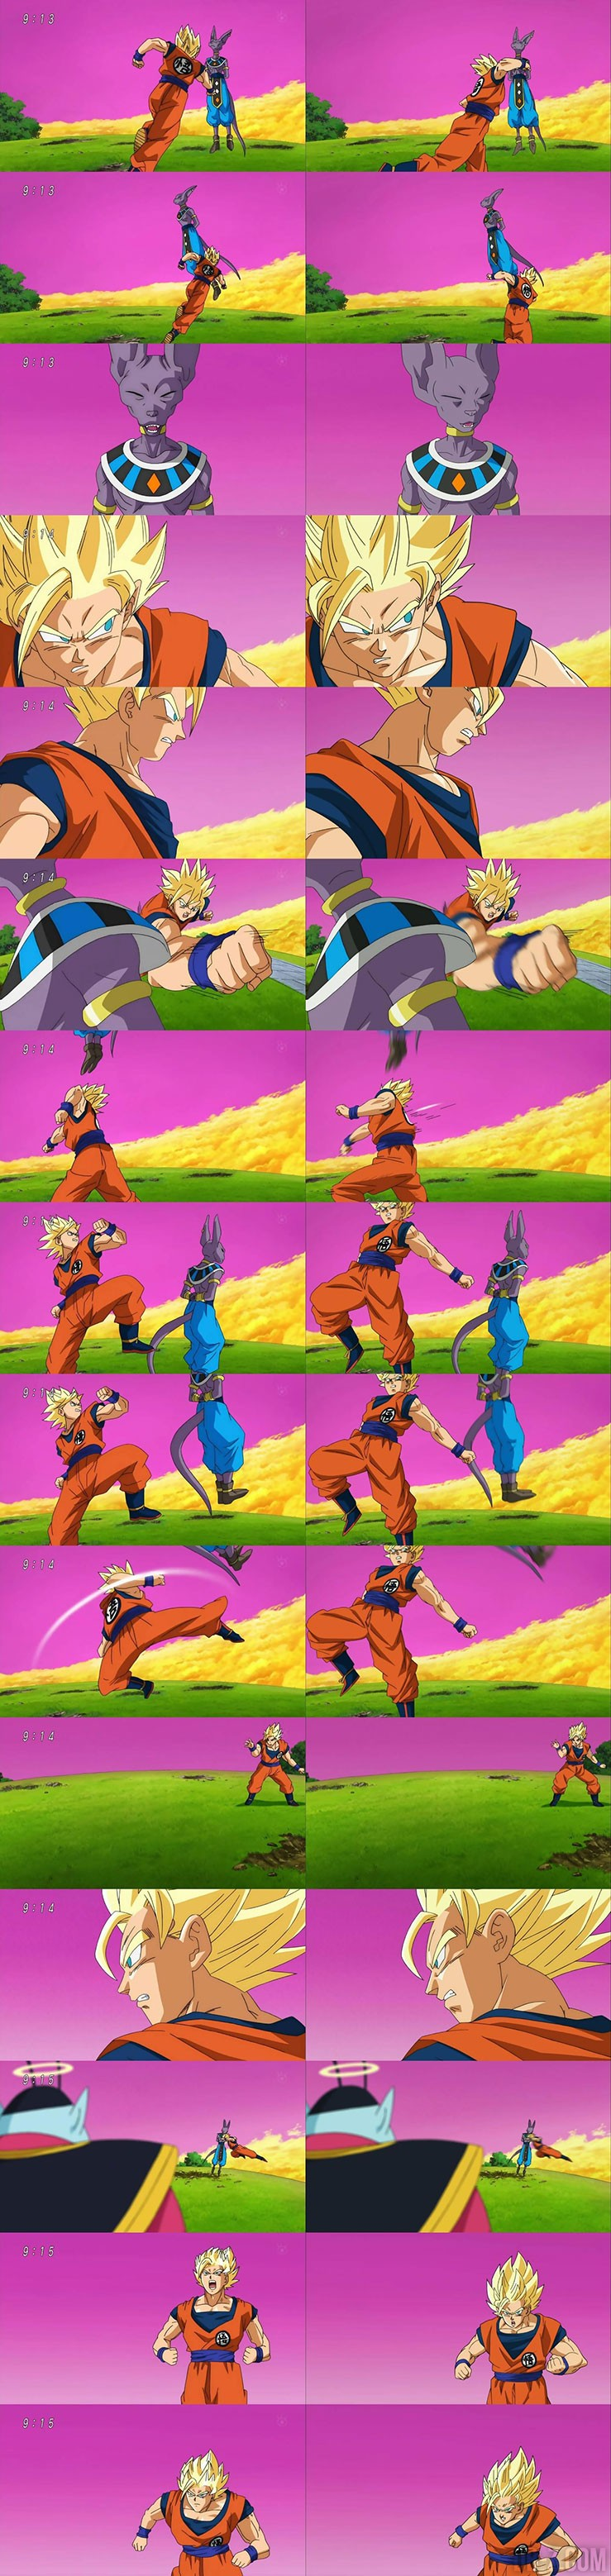 Dragon-Ball-Super-Episode-5-v2-b